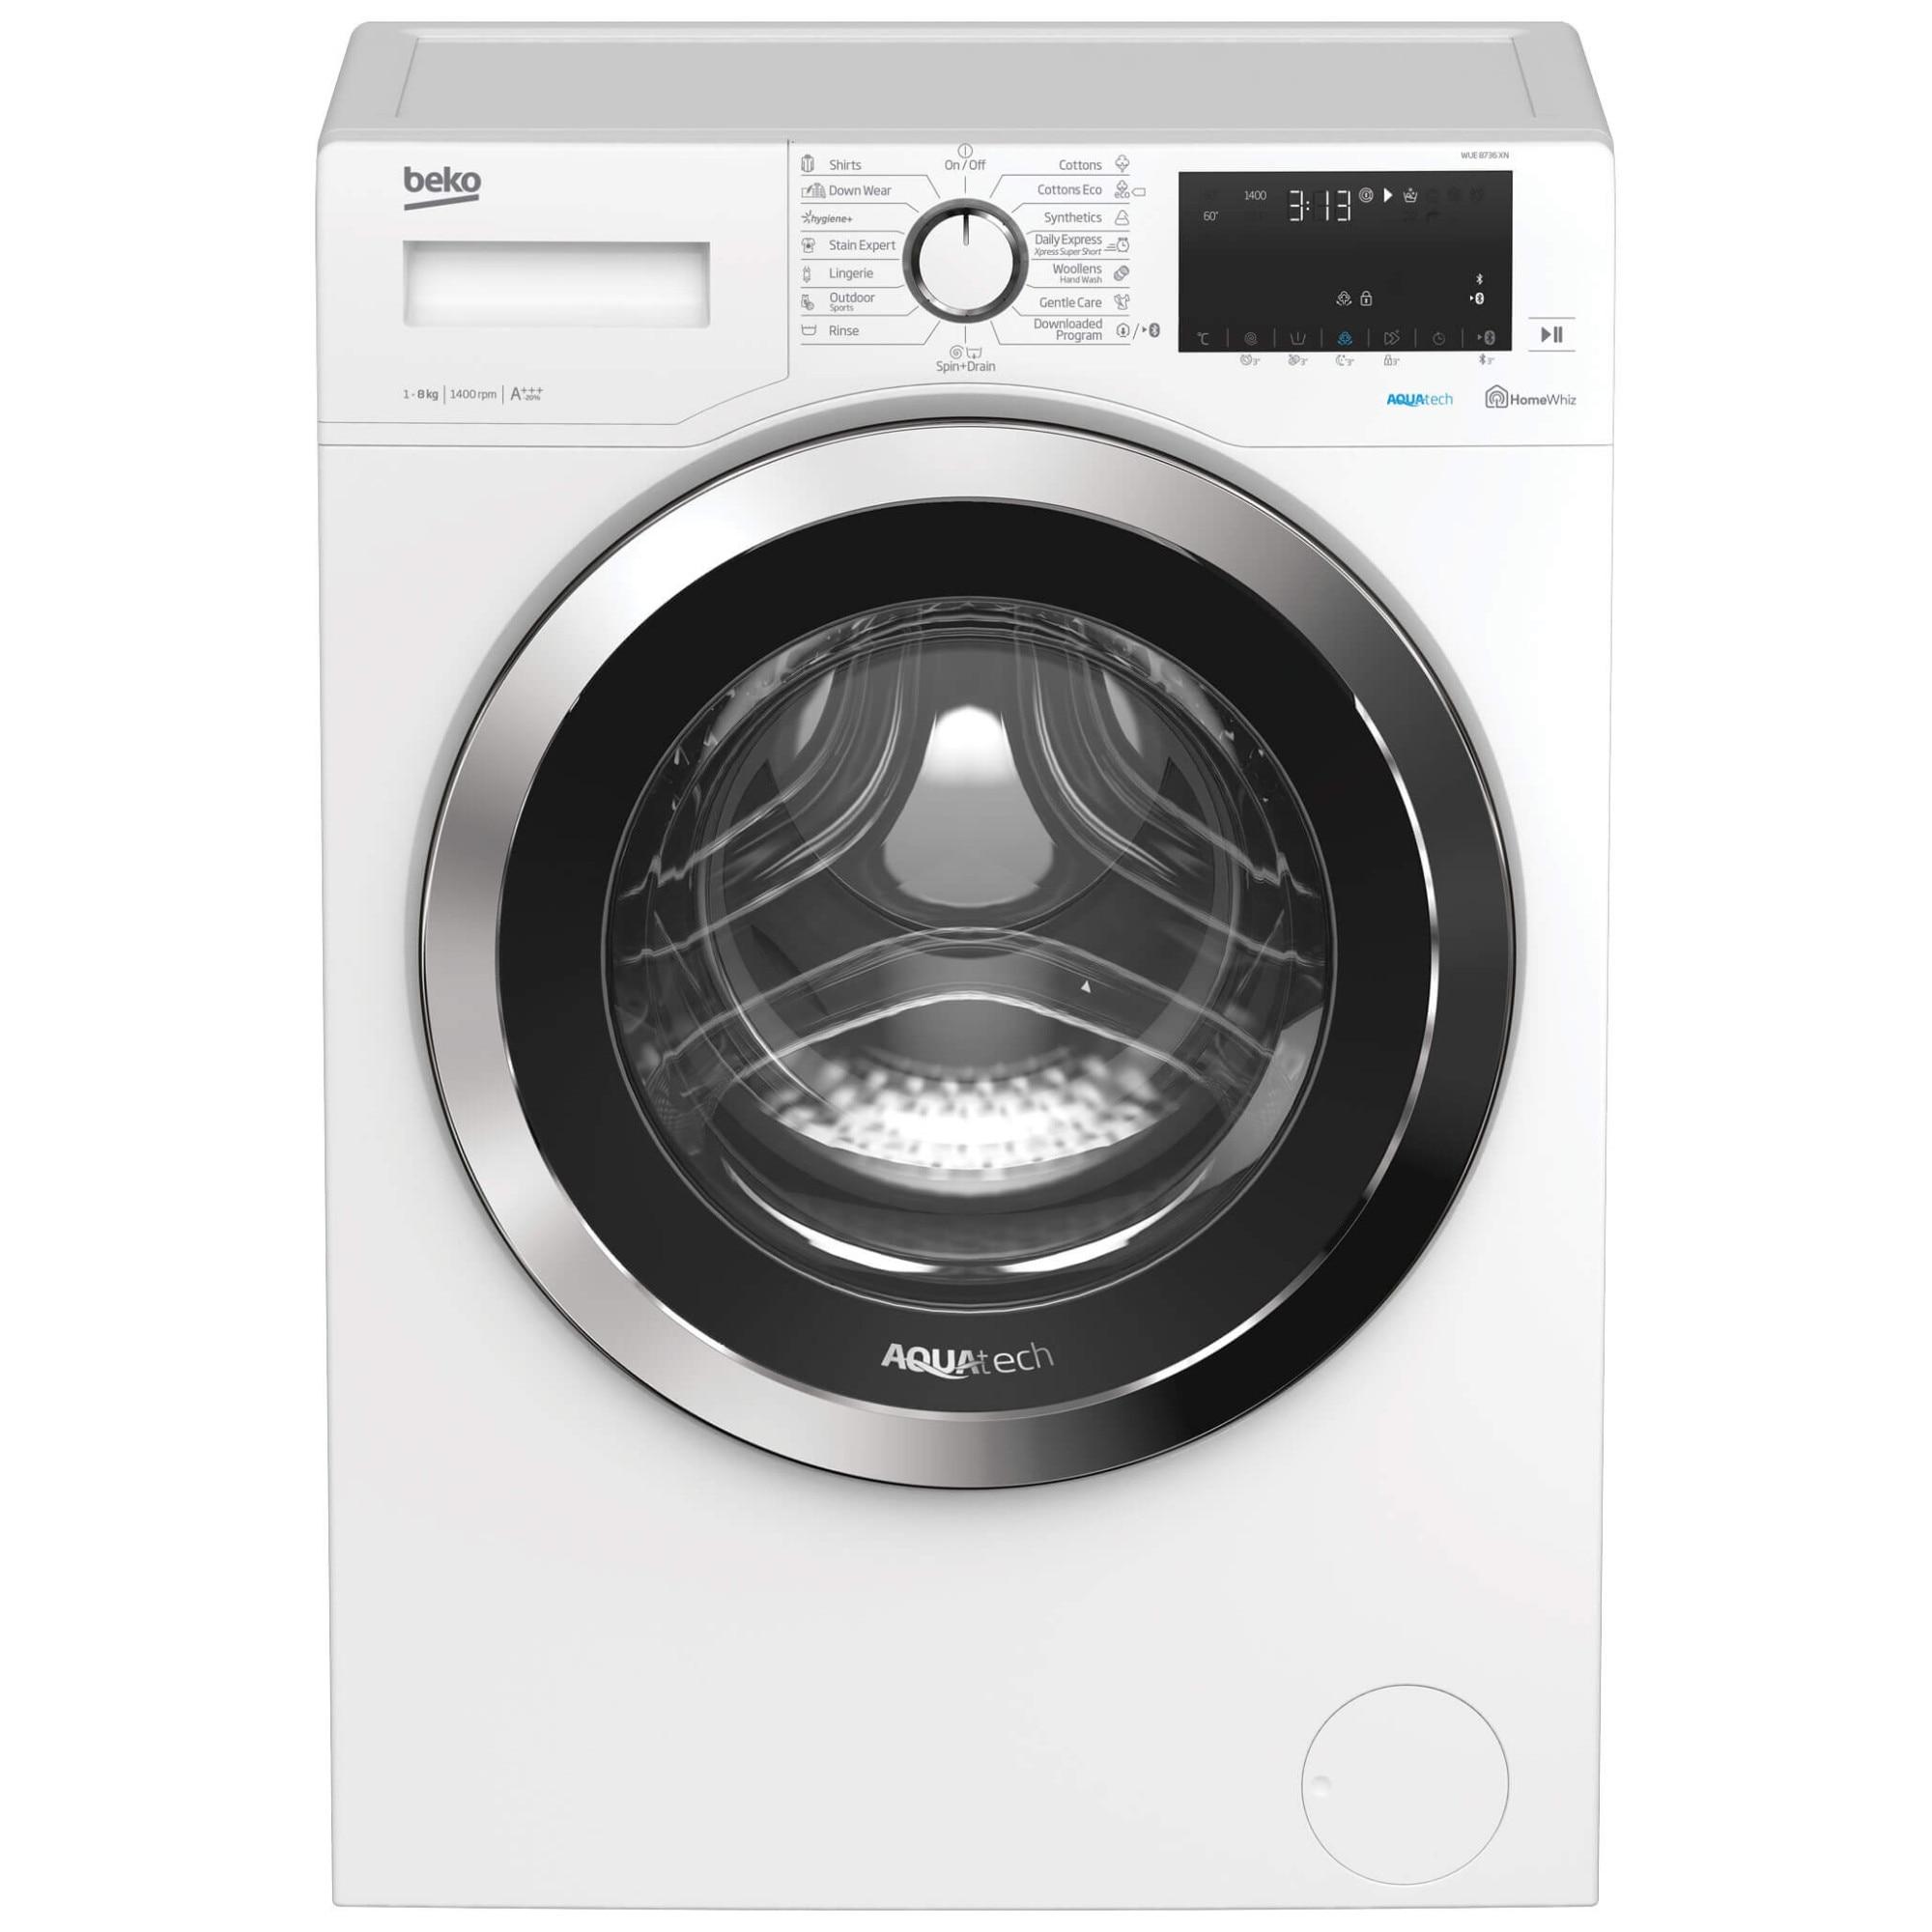 Fotografie Masina de spalat rufe Beko WUE8736XN, 8 kg, 1400 RPM, Clasa A+++, AquaTech, HomeWhiz, Bluetooth, SteamCure, Add Garment, Motor ProSmart Inverter, Hygiene+, Gri